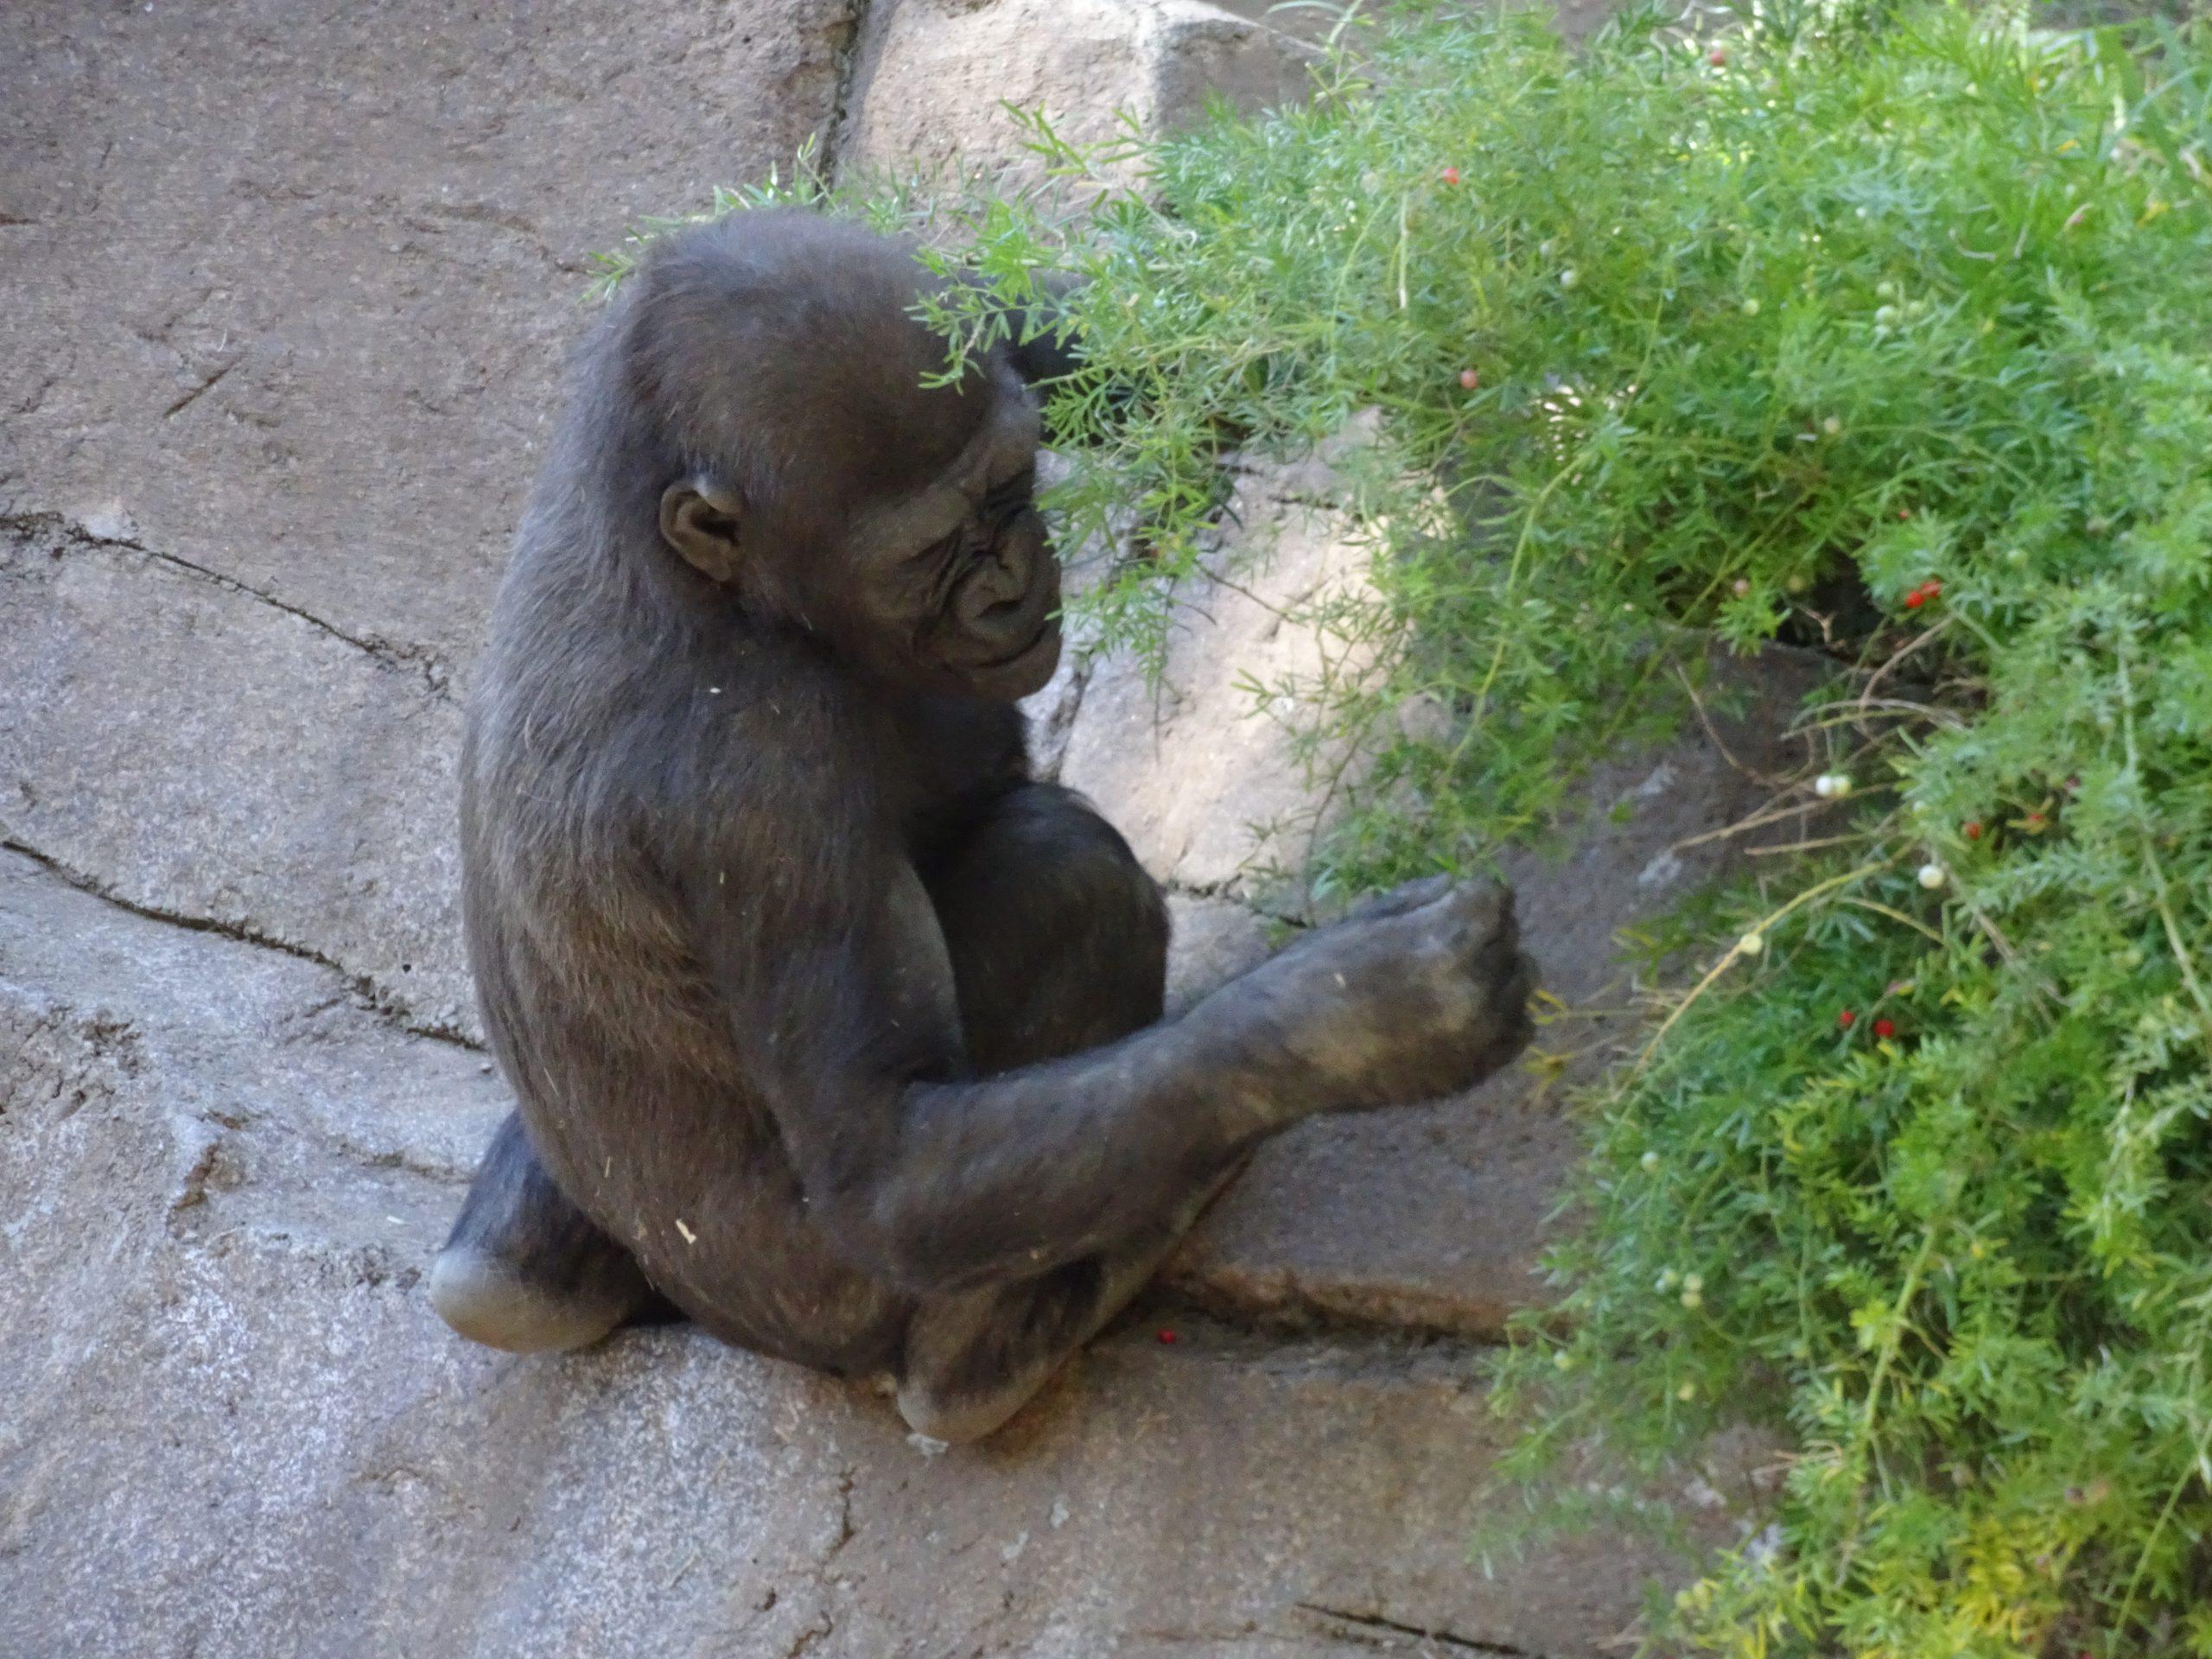 Safari Park Baby Gorilla